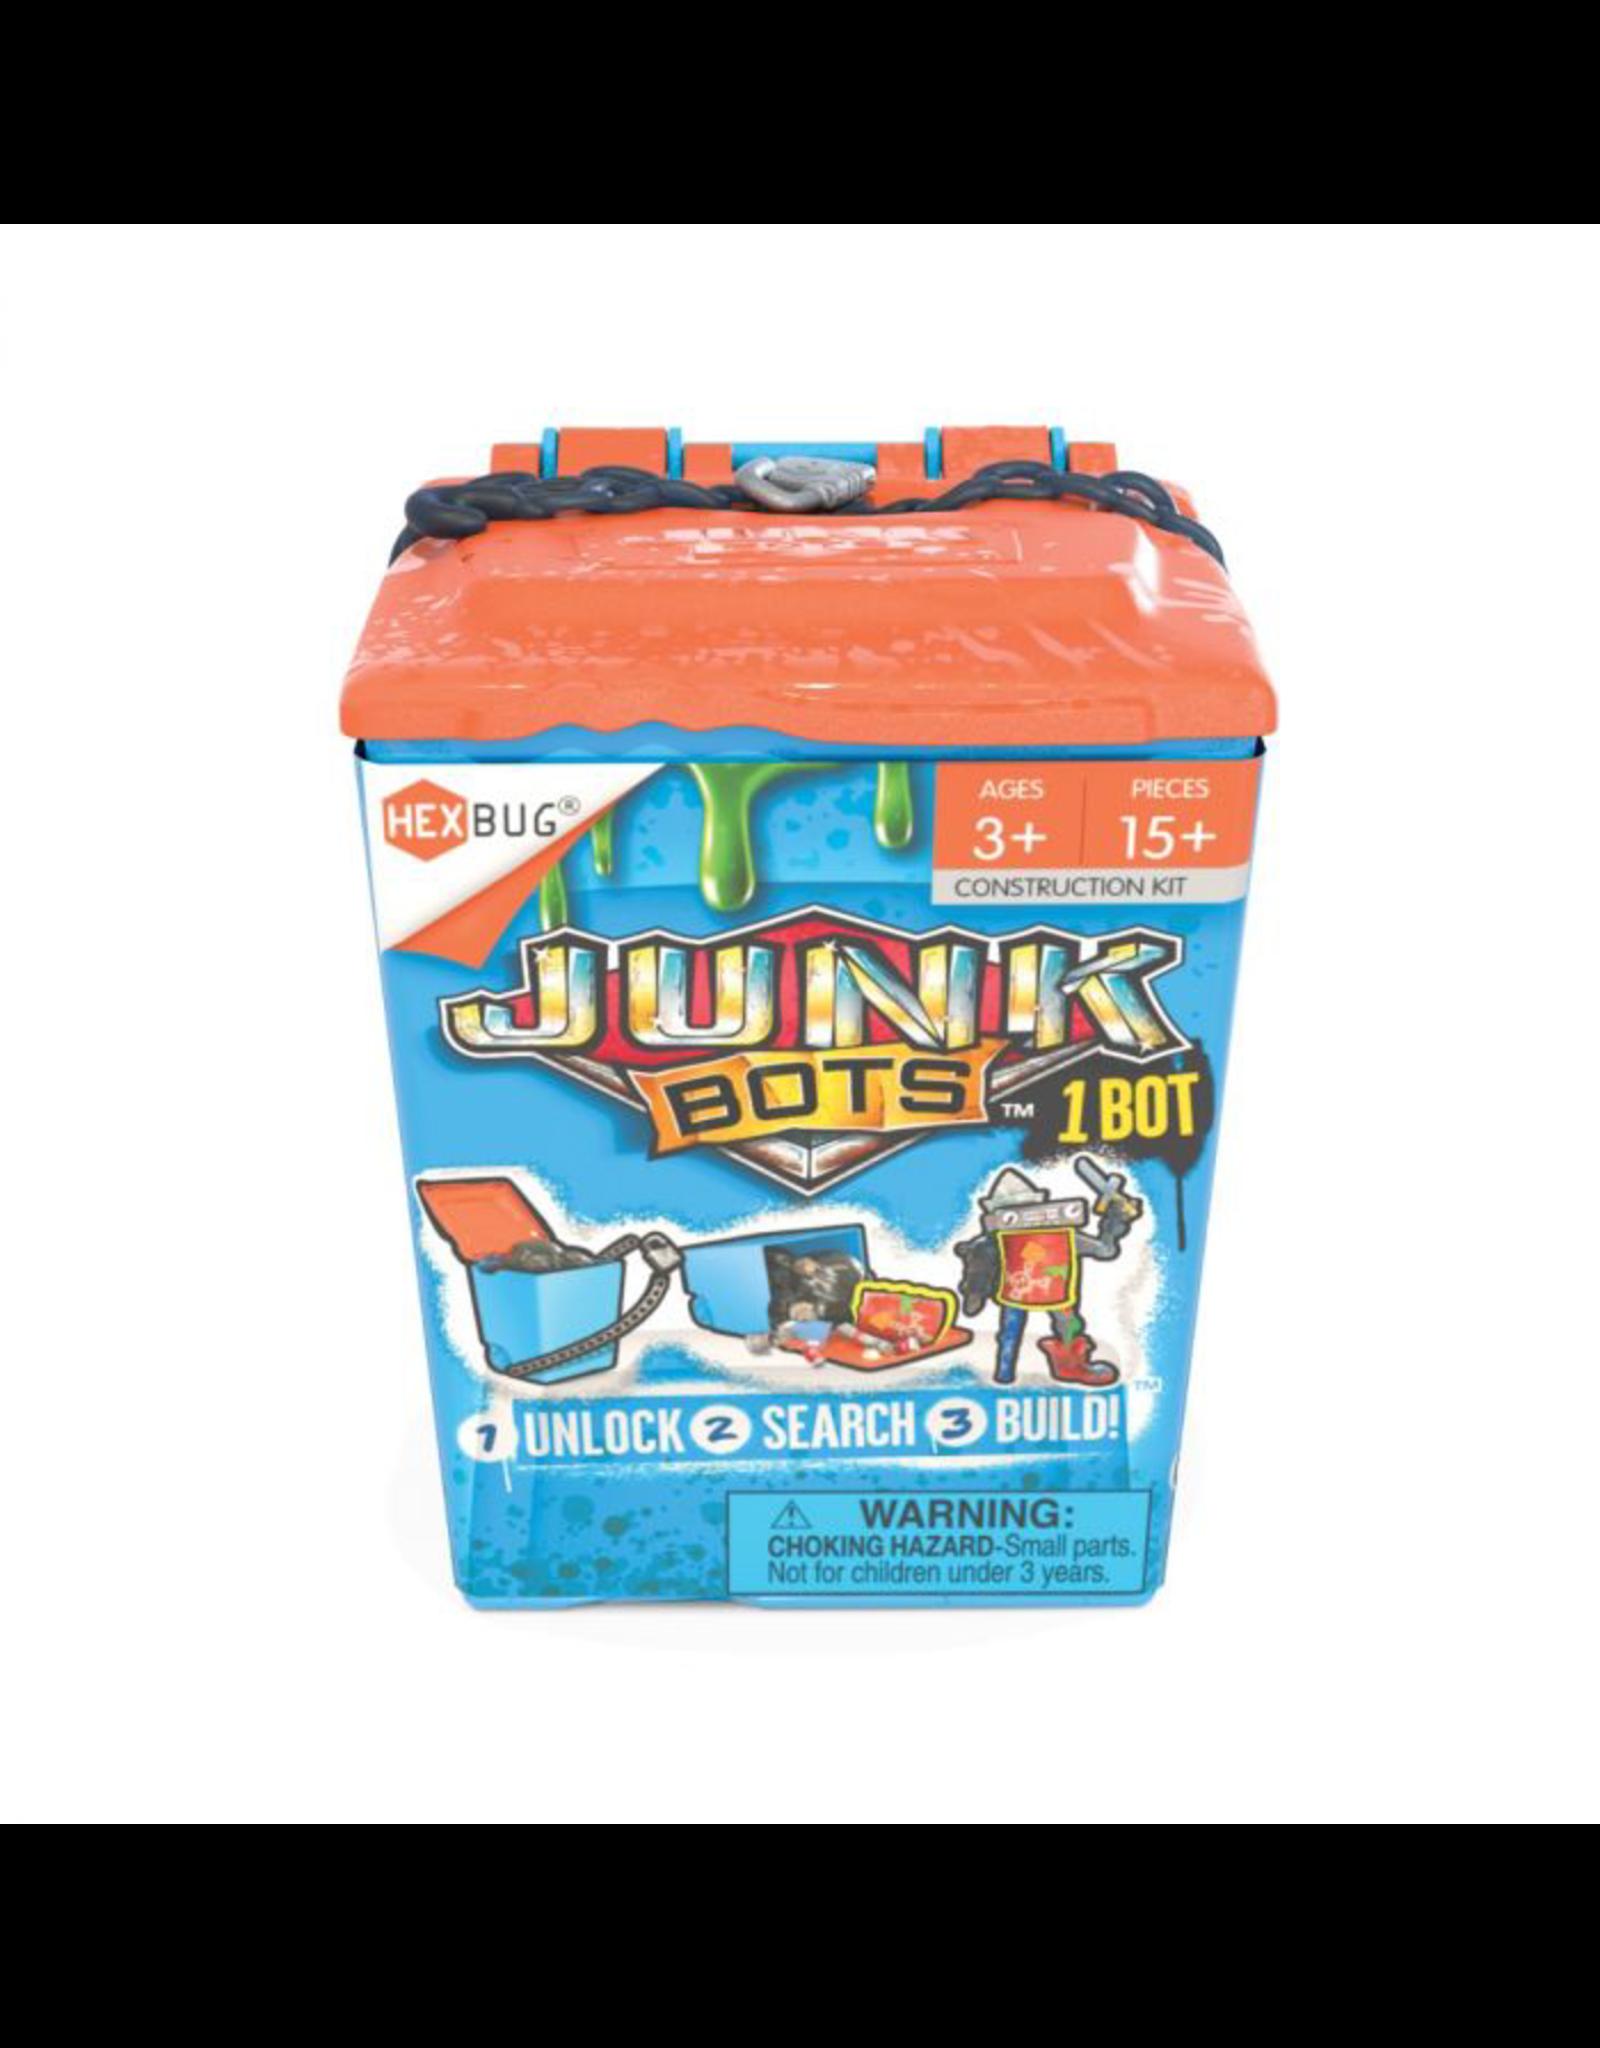 Hexbug HEXBUGS Junkbots Trash Bin